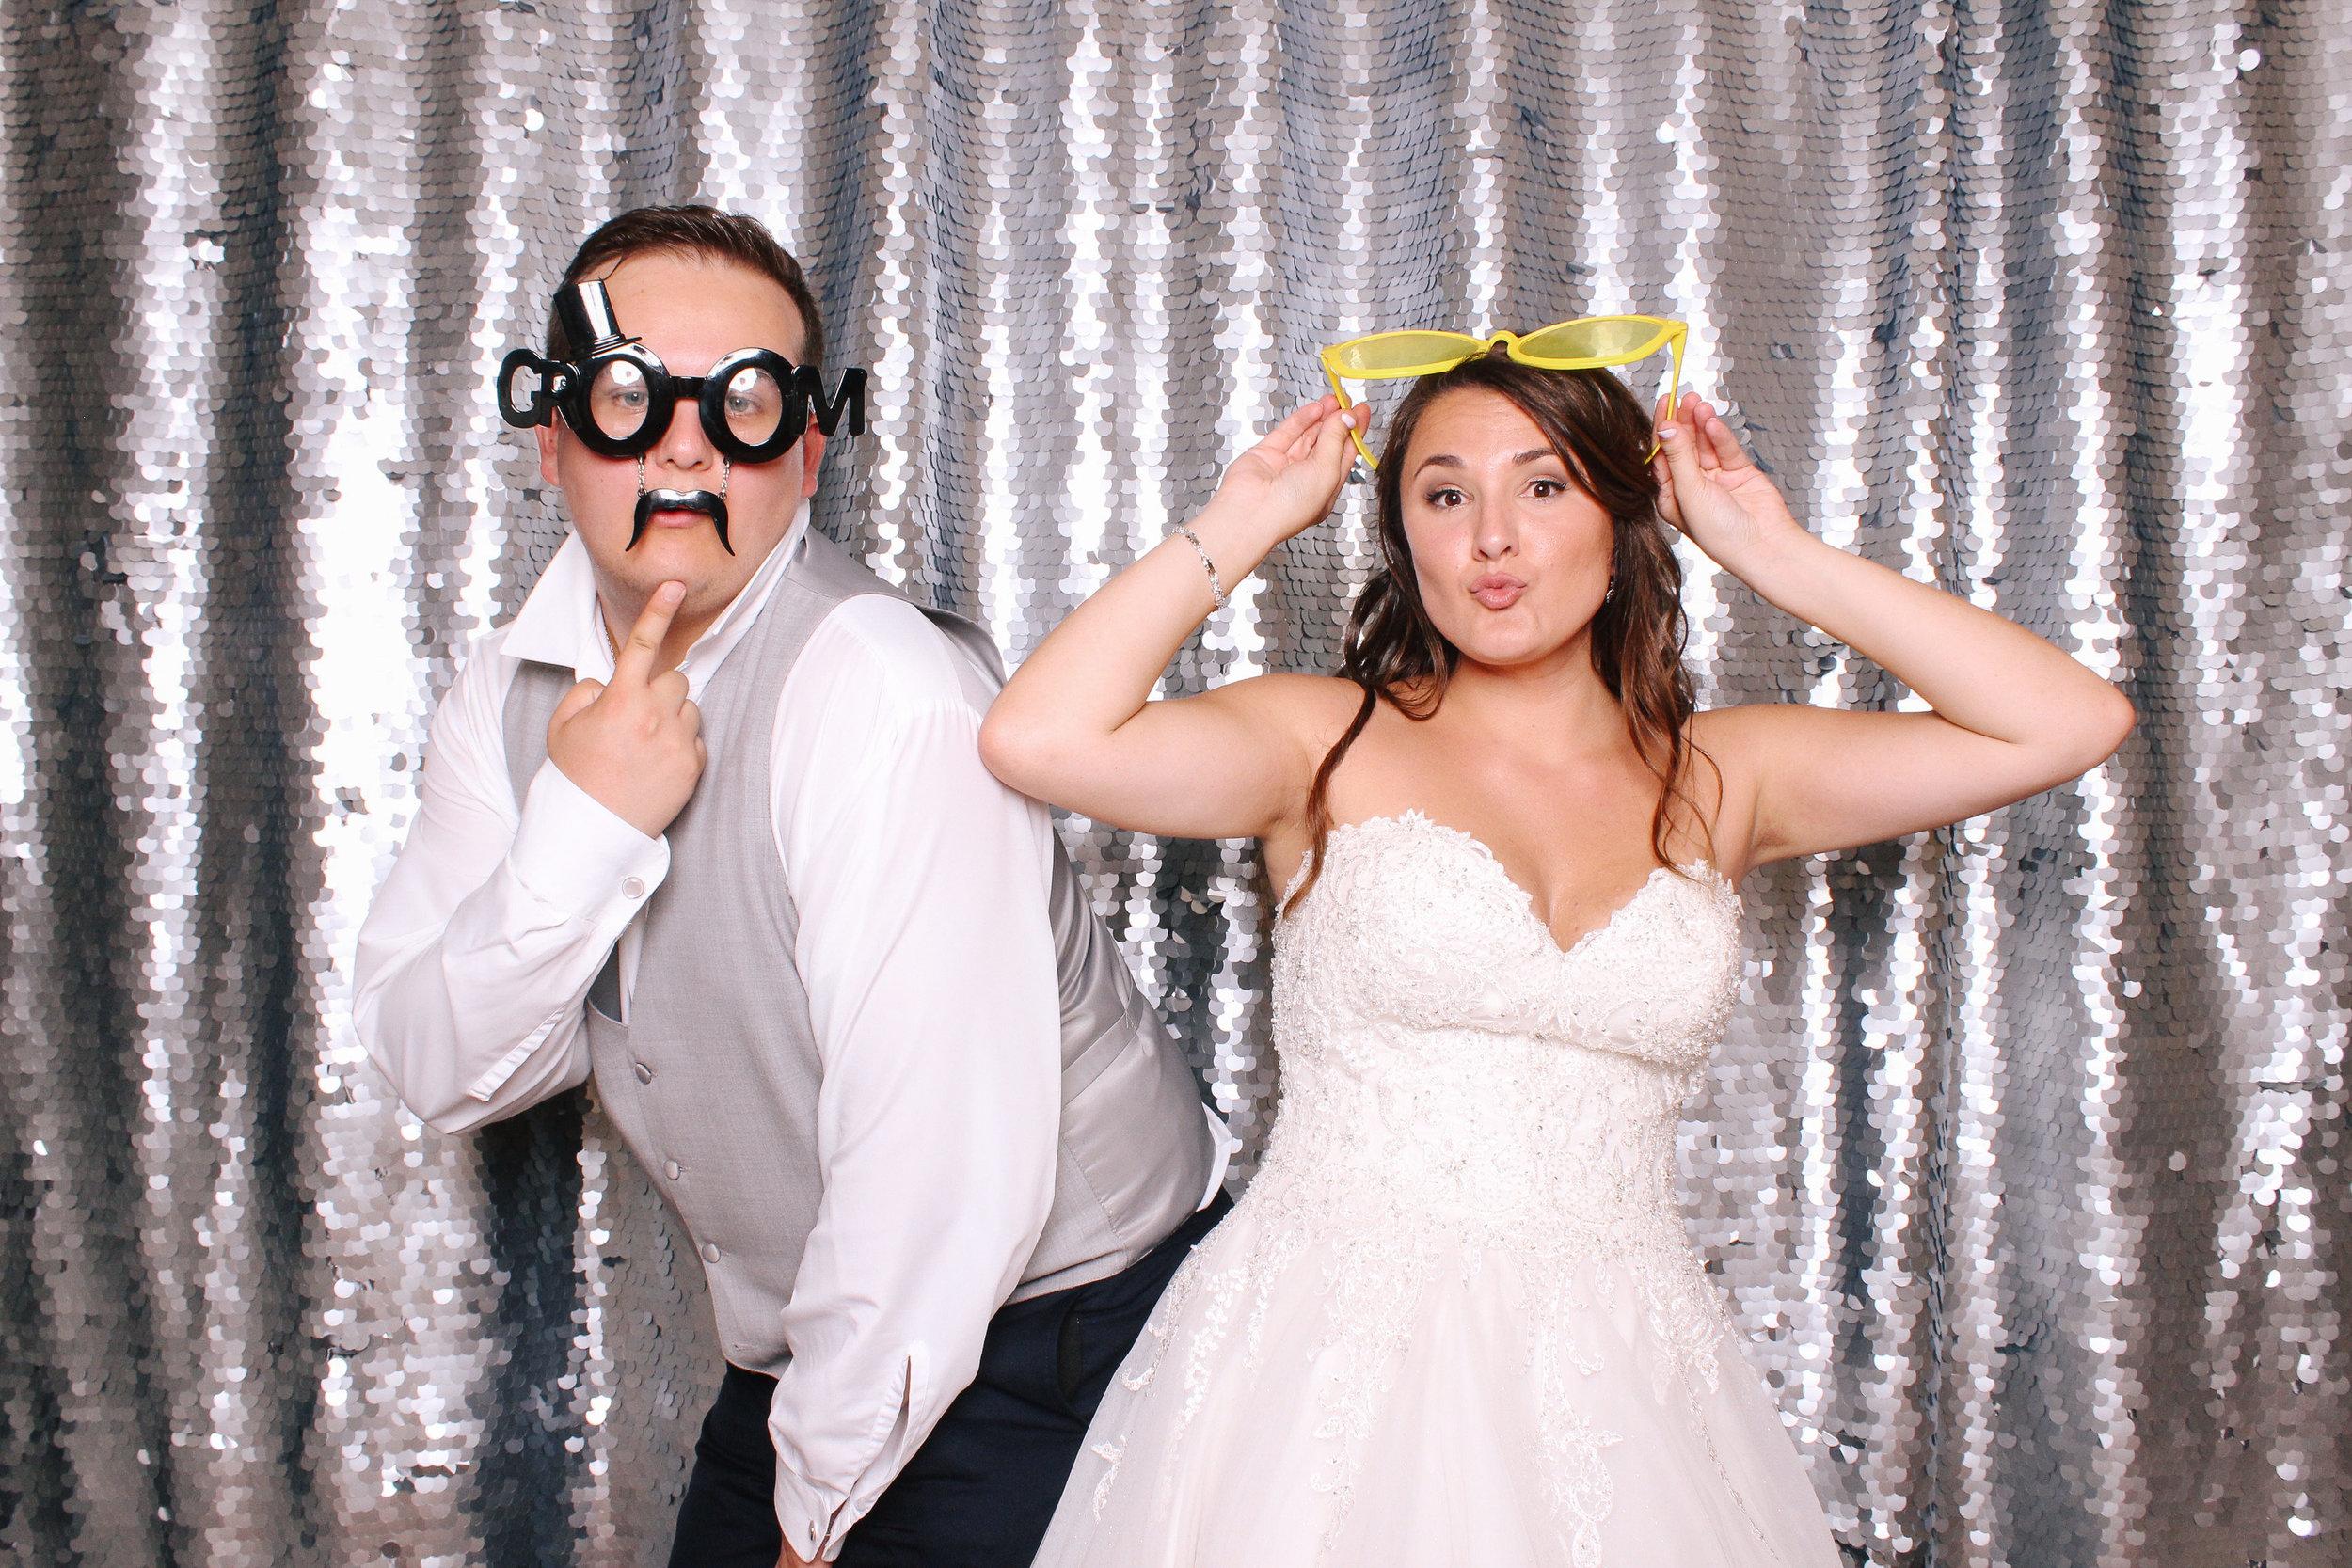 0203 Cleveland Wedding Photobooth too much awesomeness.jpg